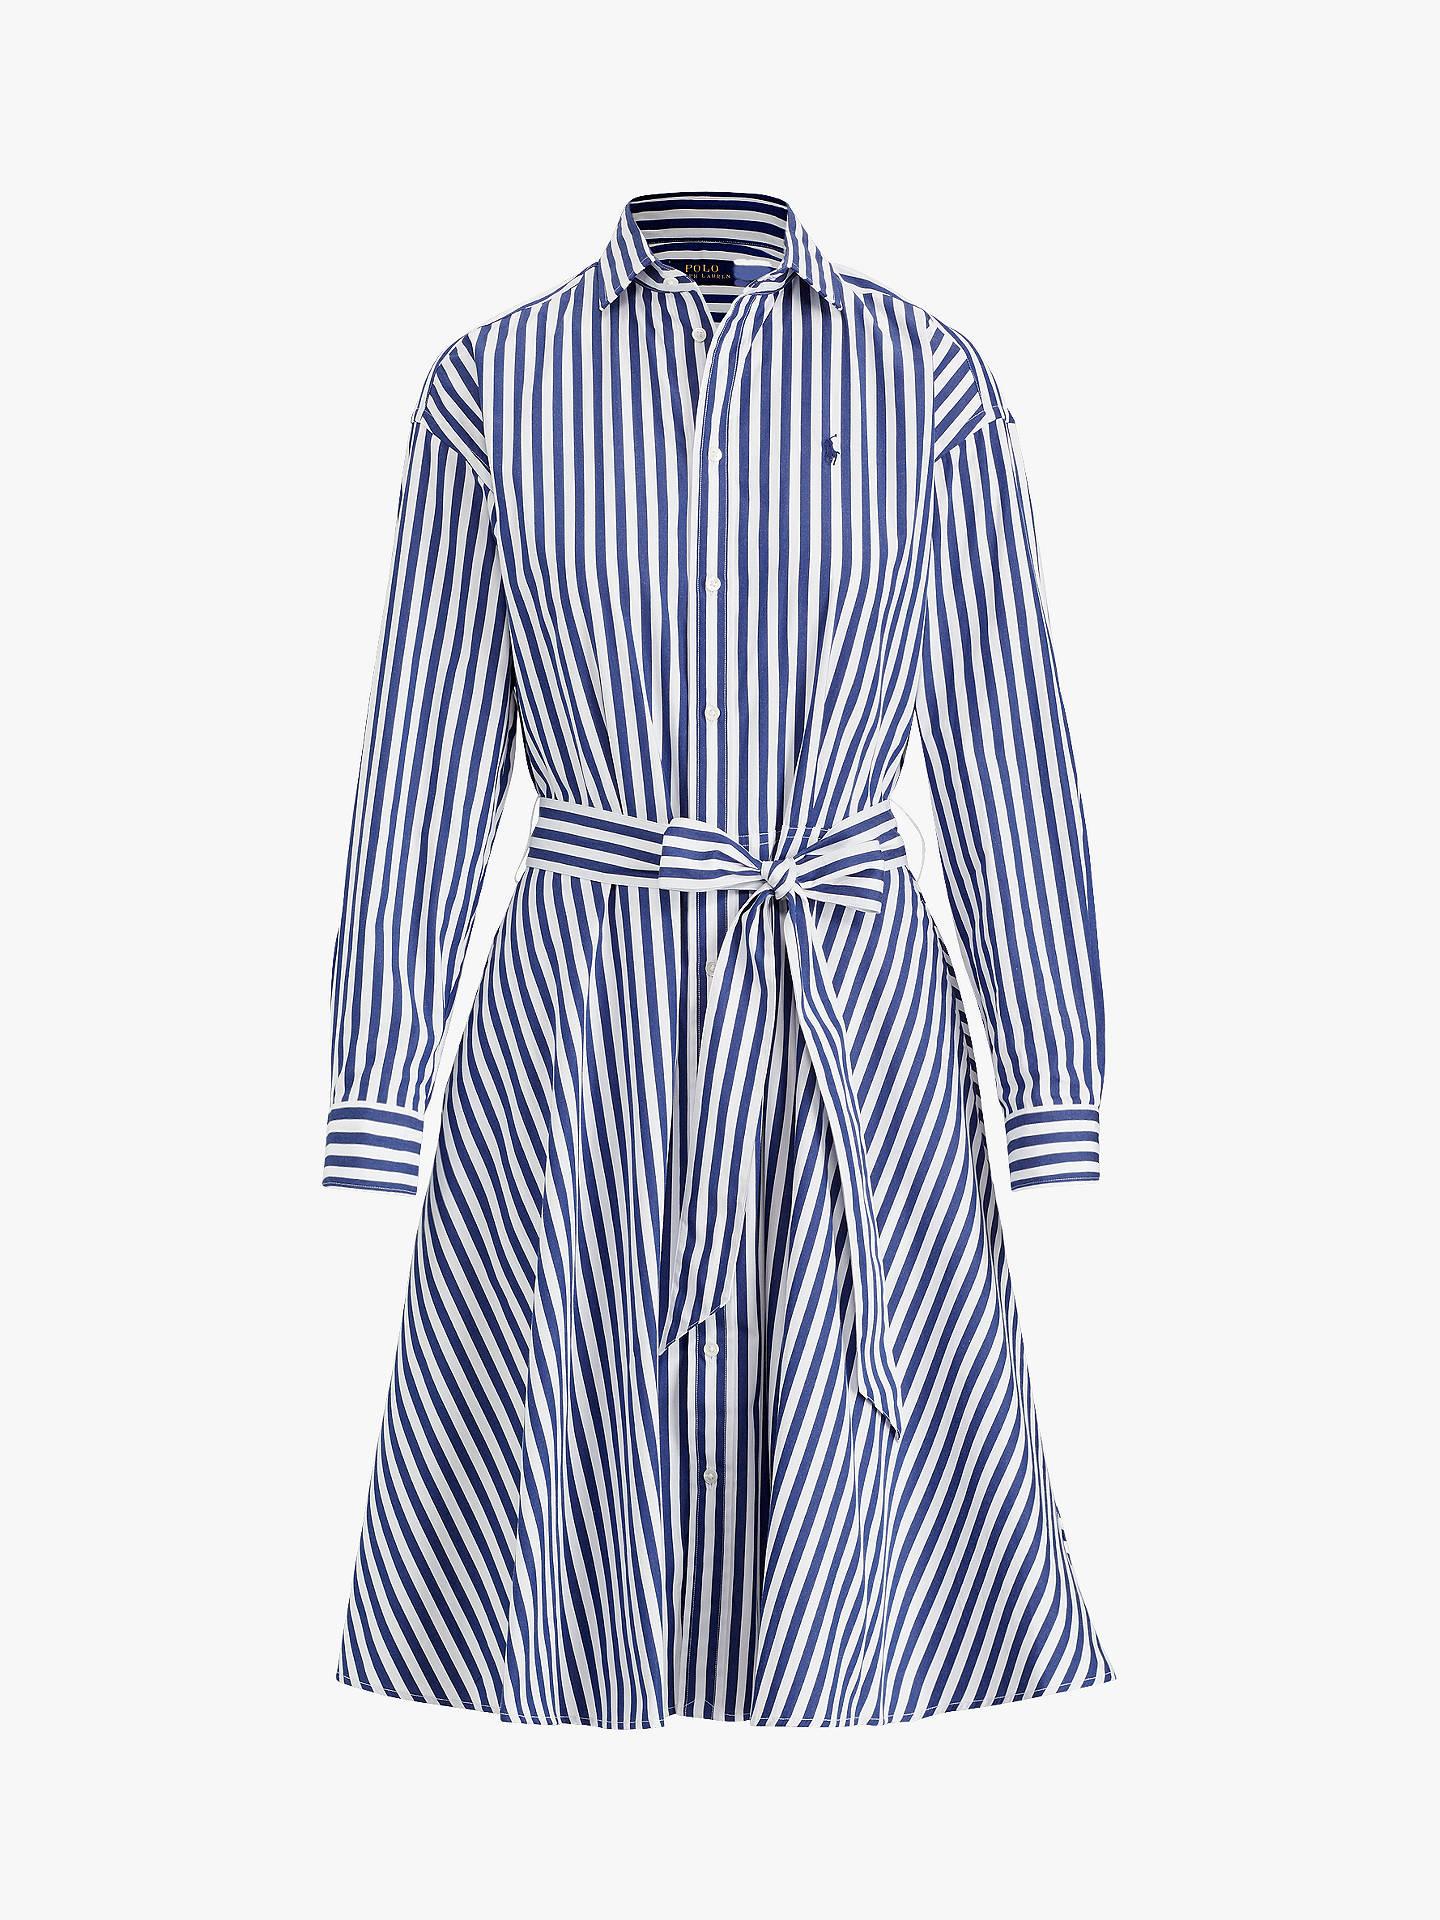 Stripe John Lauren At Ralph Polo Shirt DressNavywhite Bengal H9DY2bIeWE